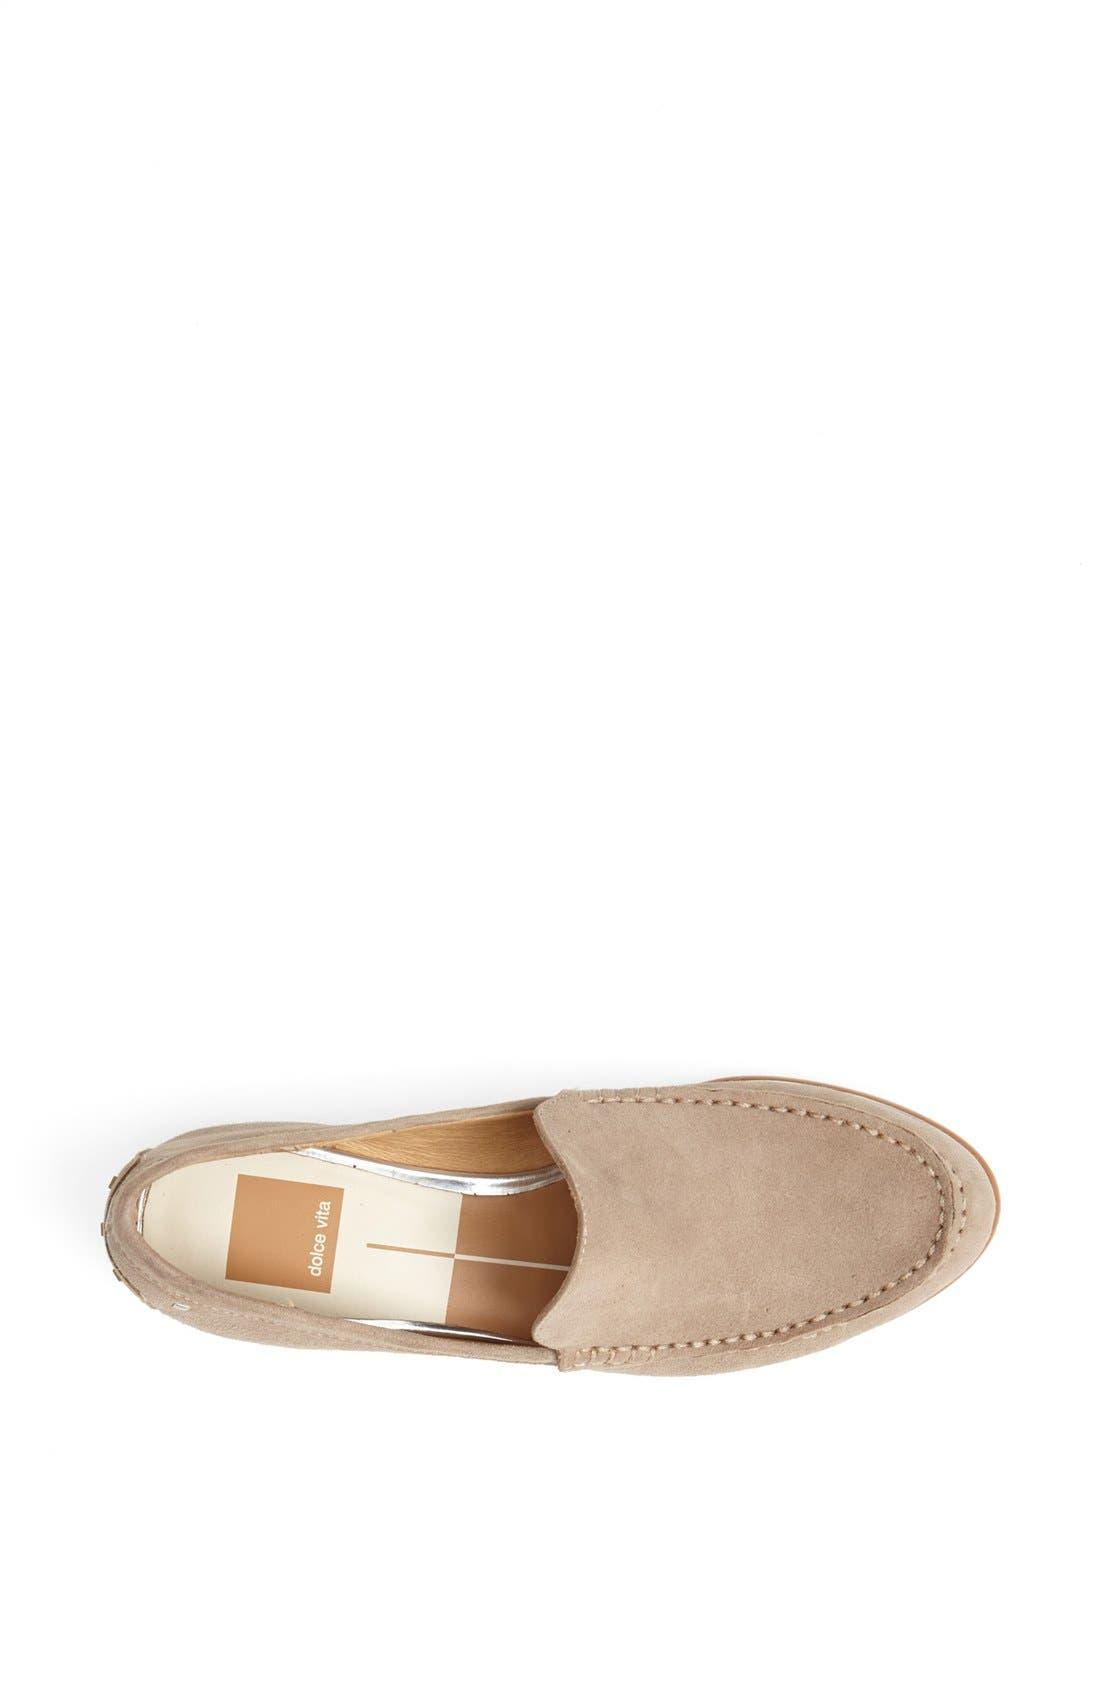 Alternate Image 3  - Dolce Vita 'Venka' Leather Flat